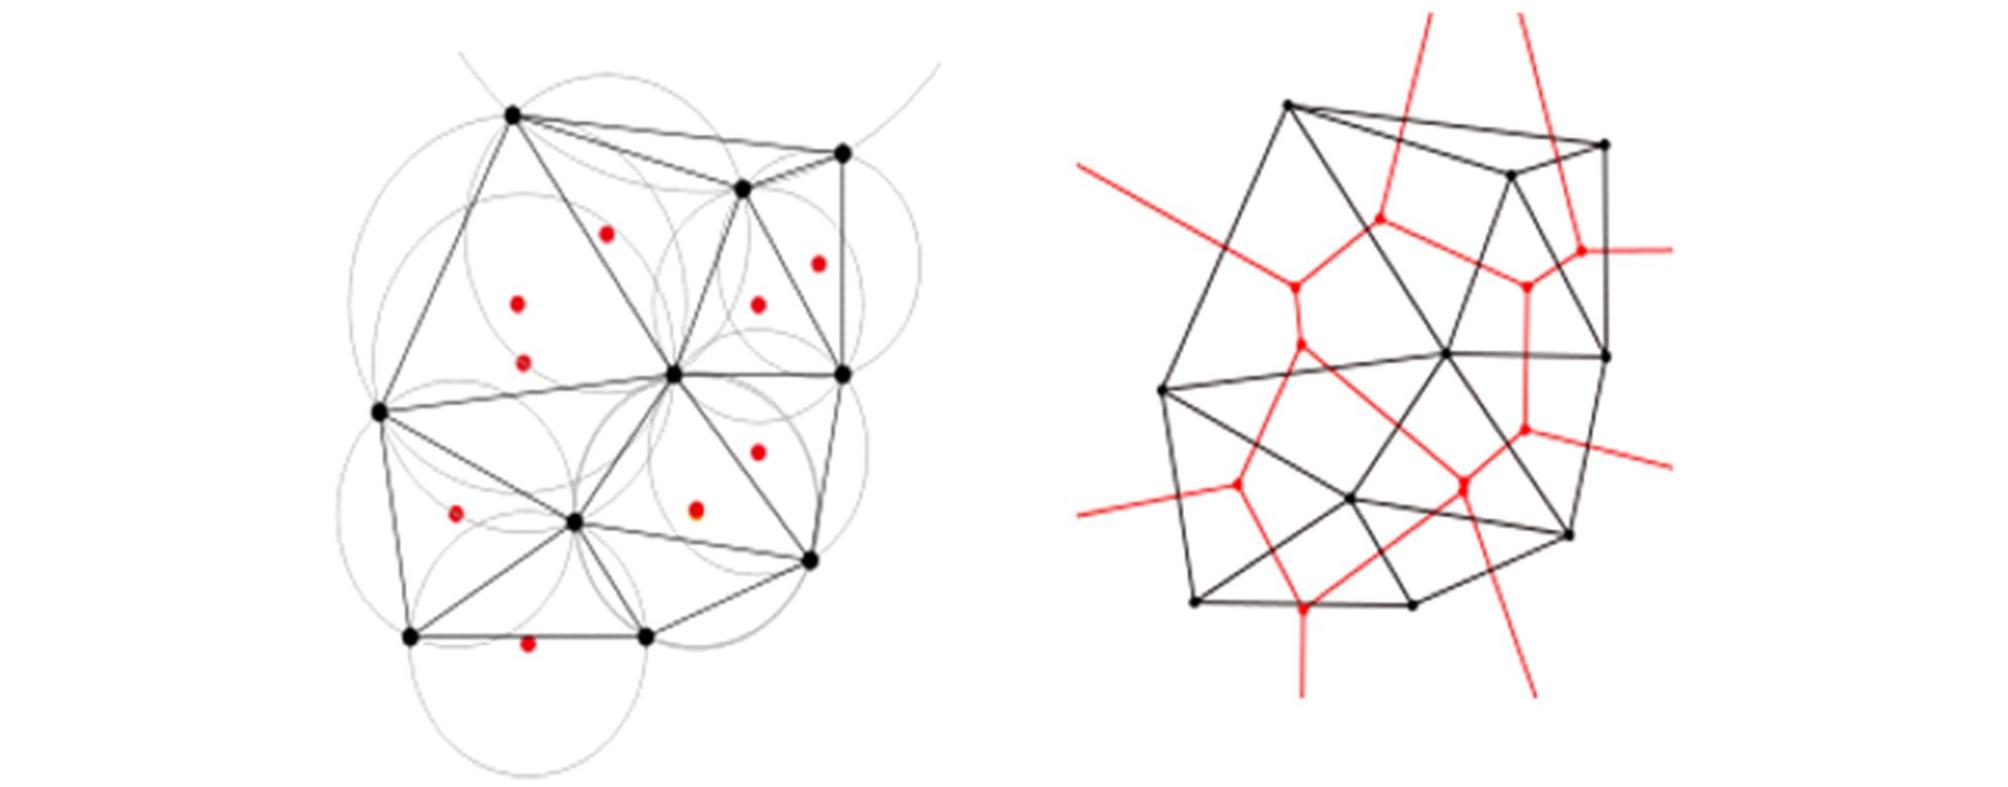 http://static.apub.kr/journalsite/sites/kwra/2020-053-06/N0200530607/images/kwra_53_06_07_F2.jpg